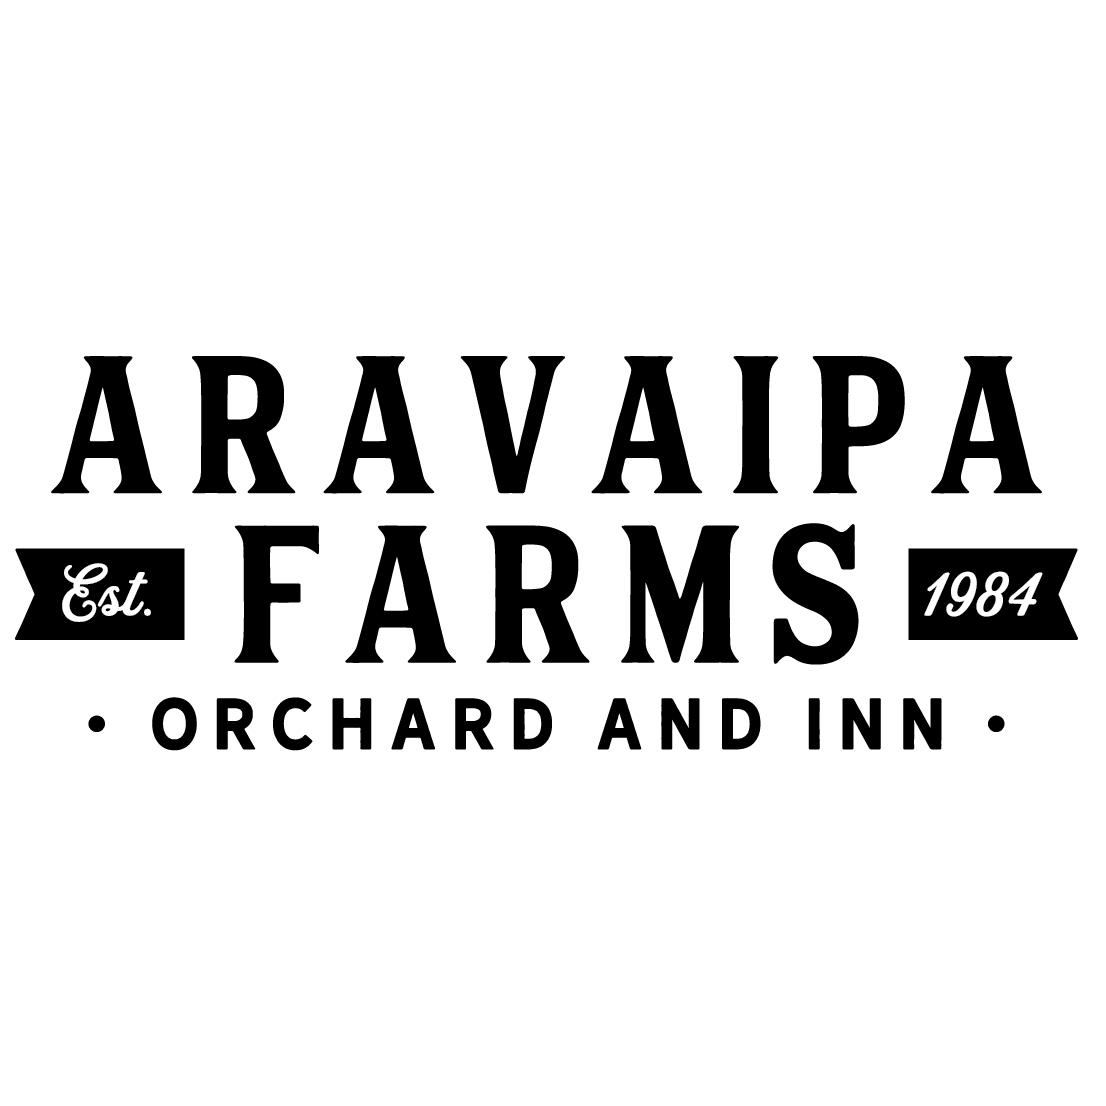 Aravaipa Farms